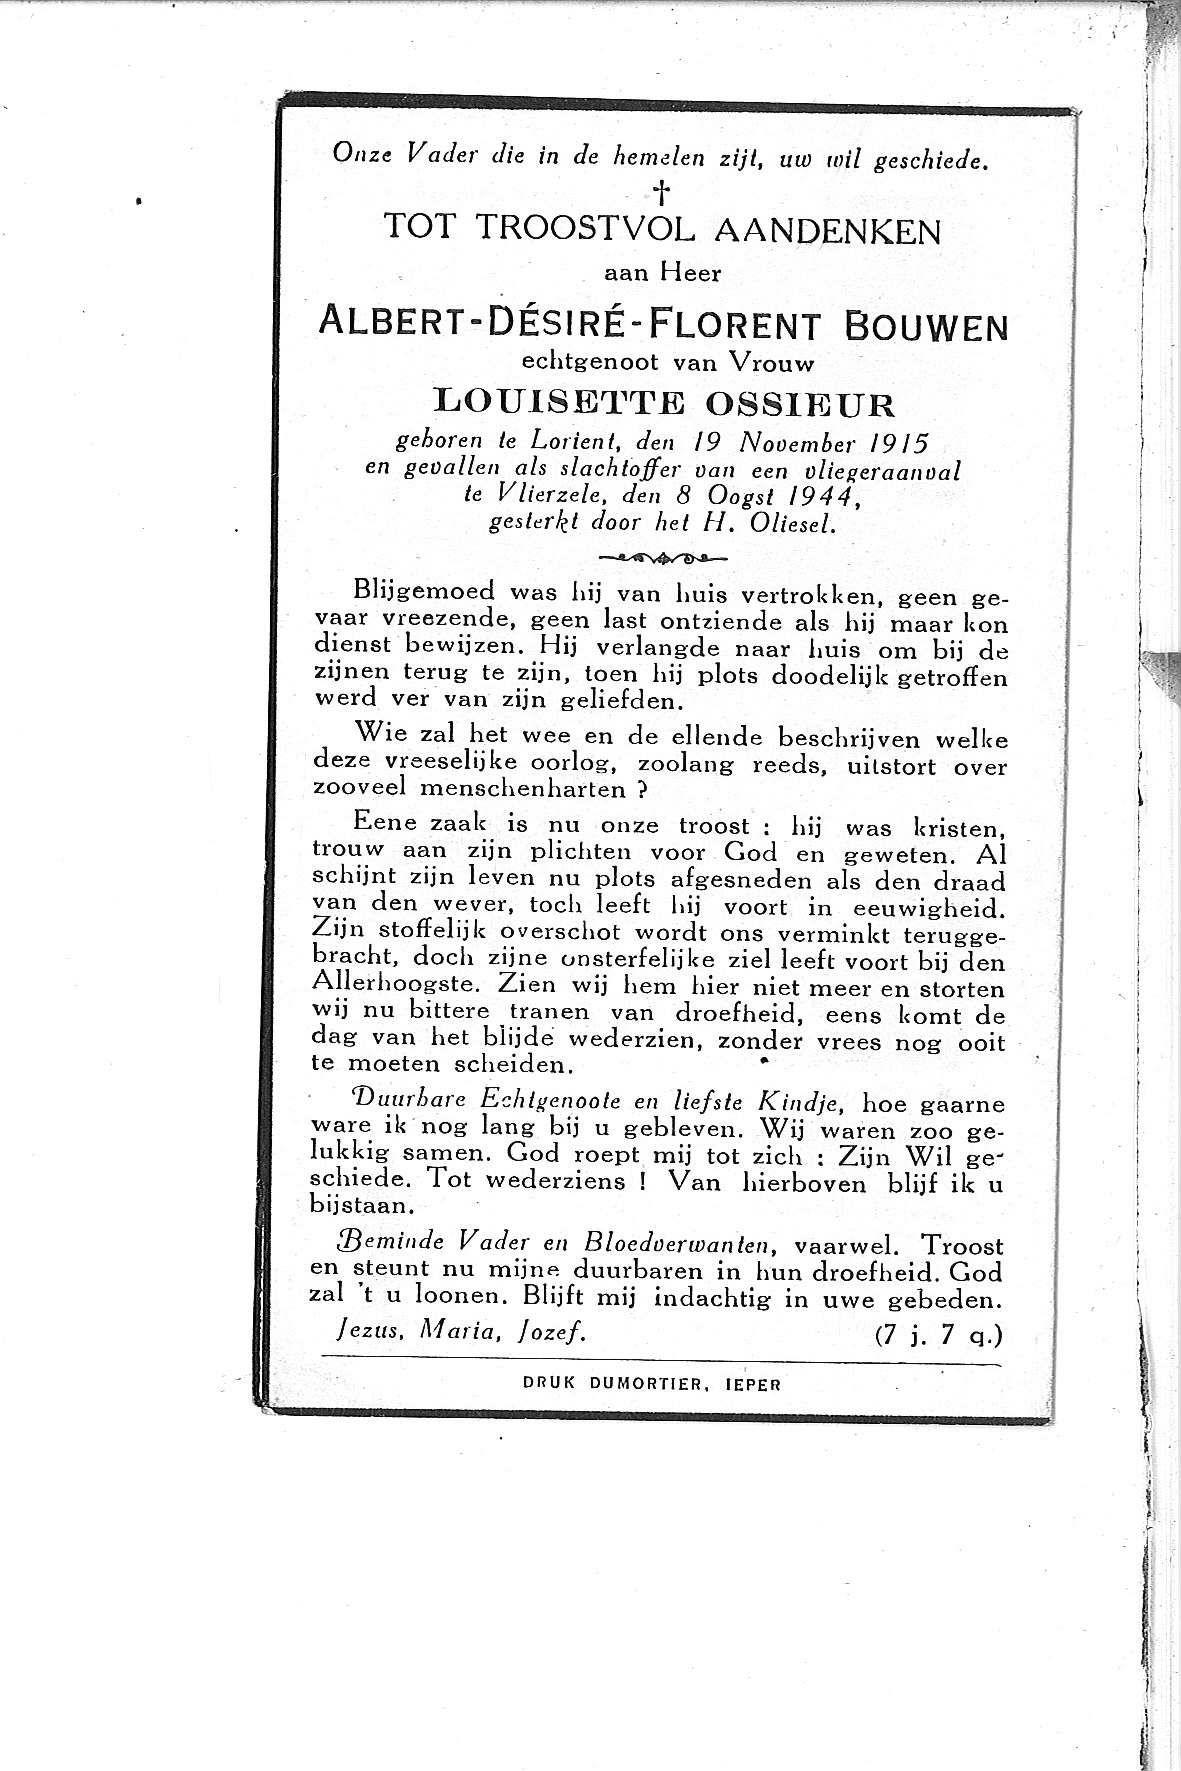 Albert-Désiré-Florent (1944) 20110712125805_00088.jpg